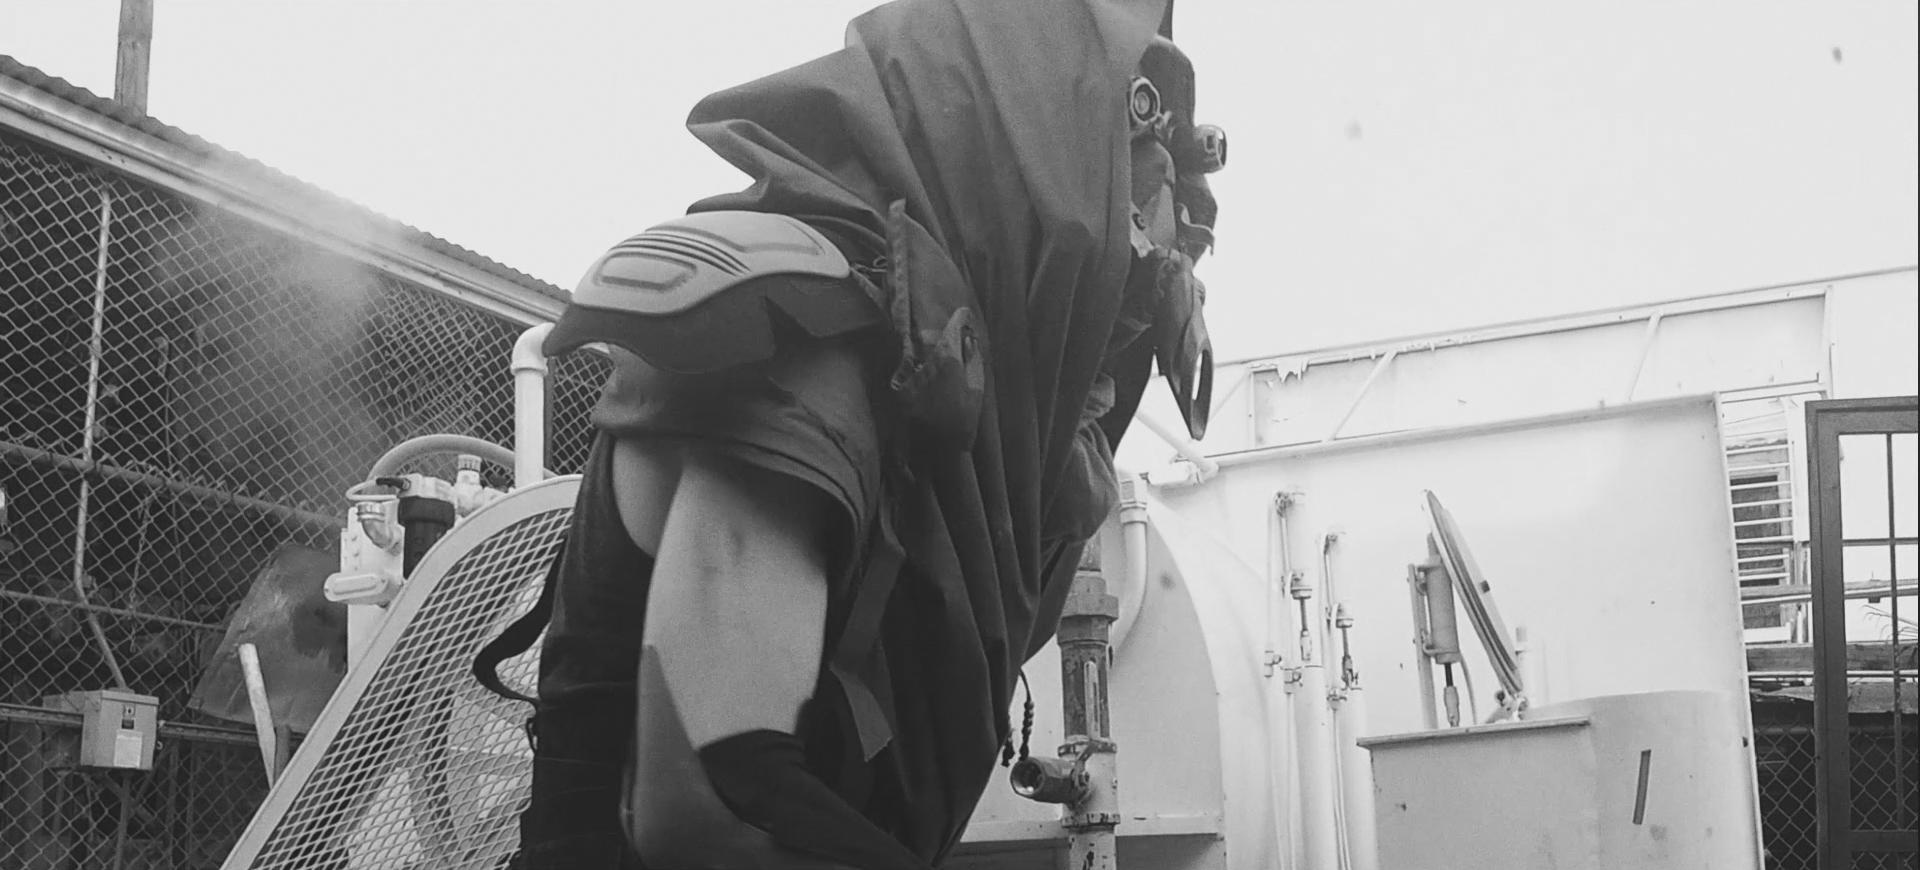 SOG_AGD_Music Video_Master_FX_Lock_v3 (0-08-15-16).jpg